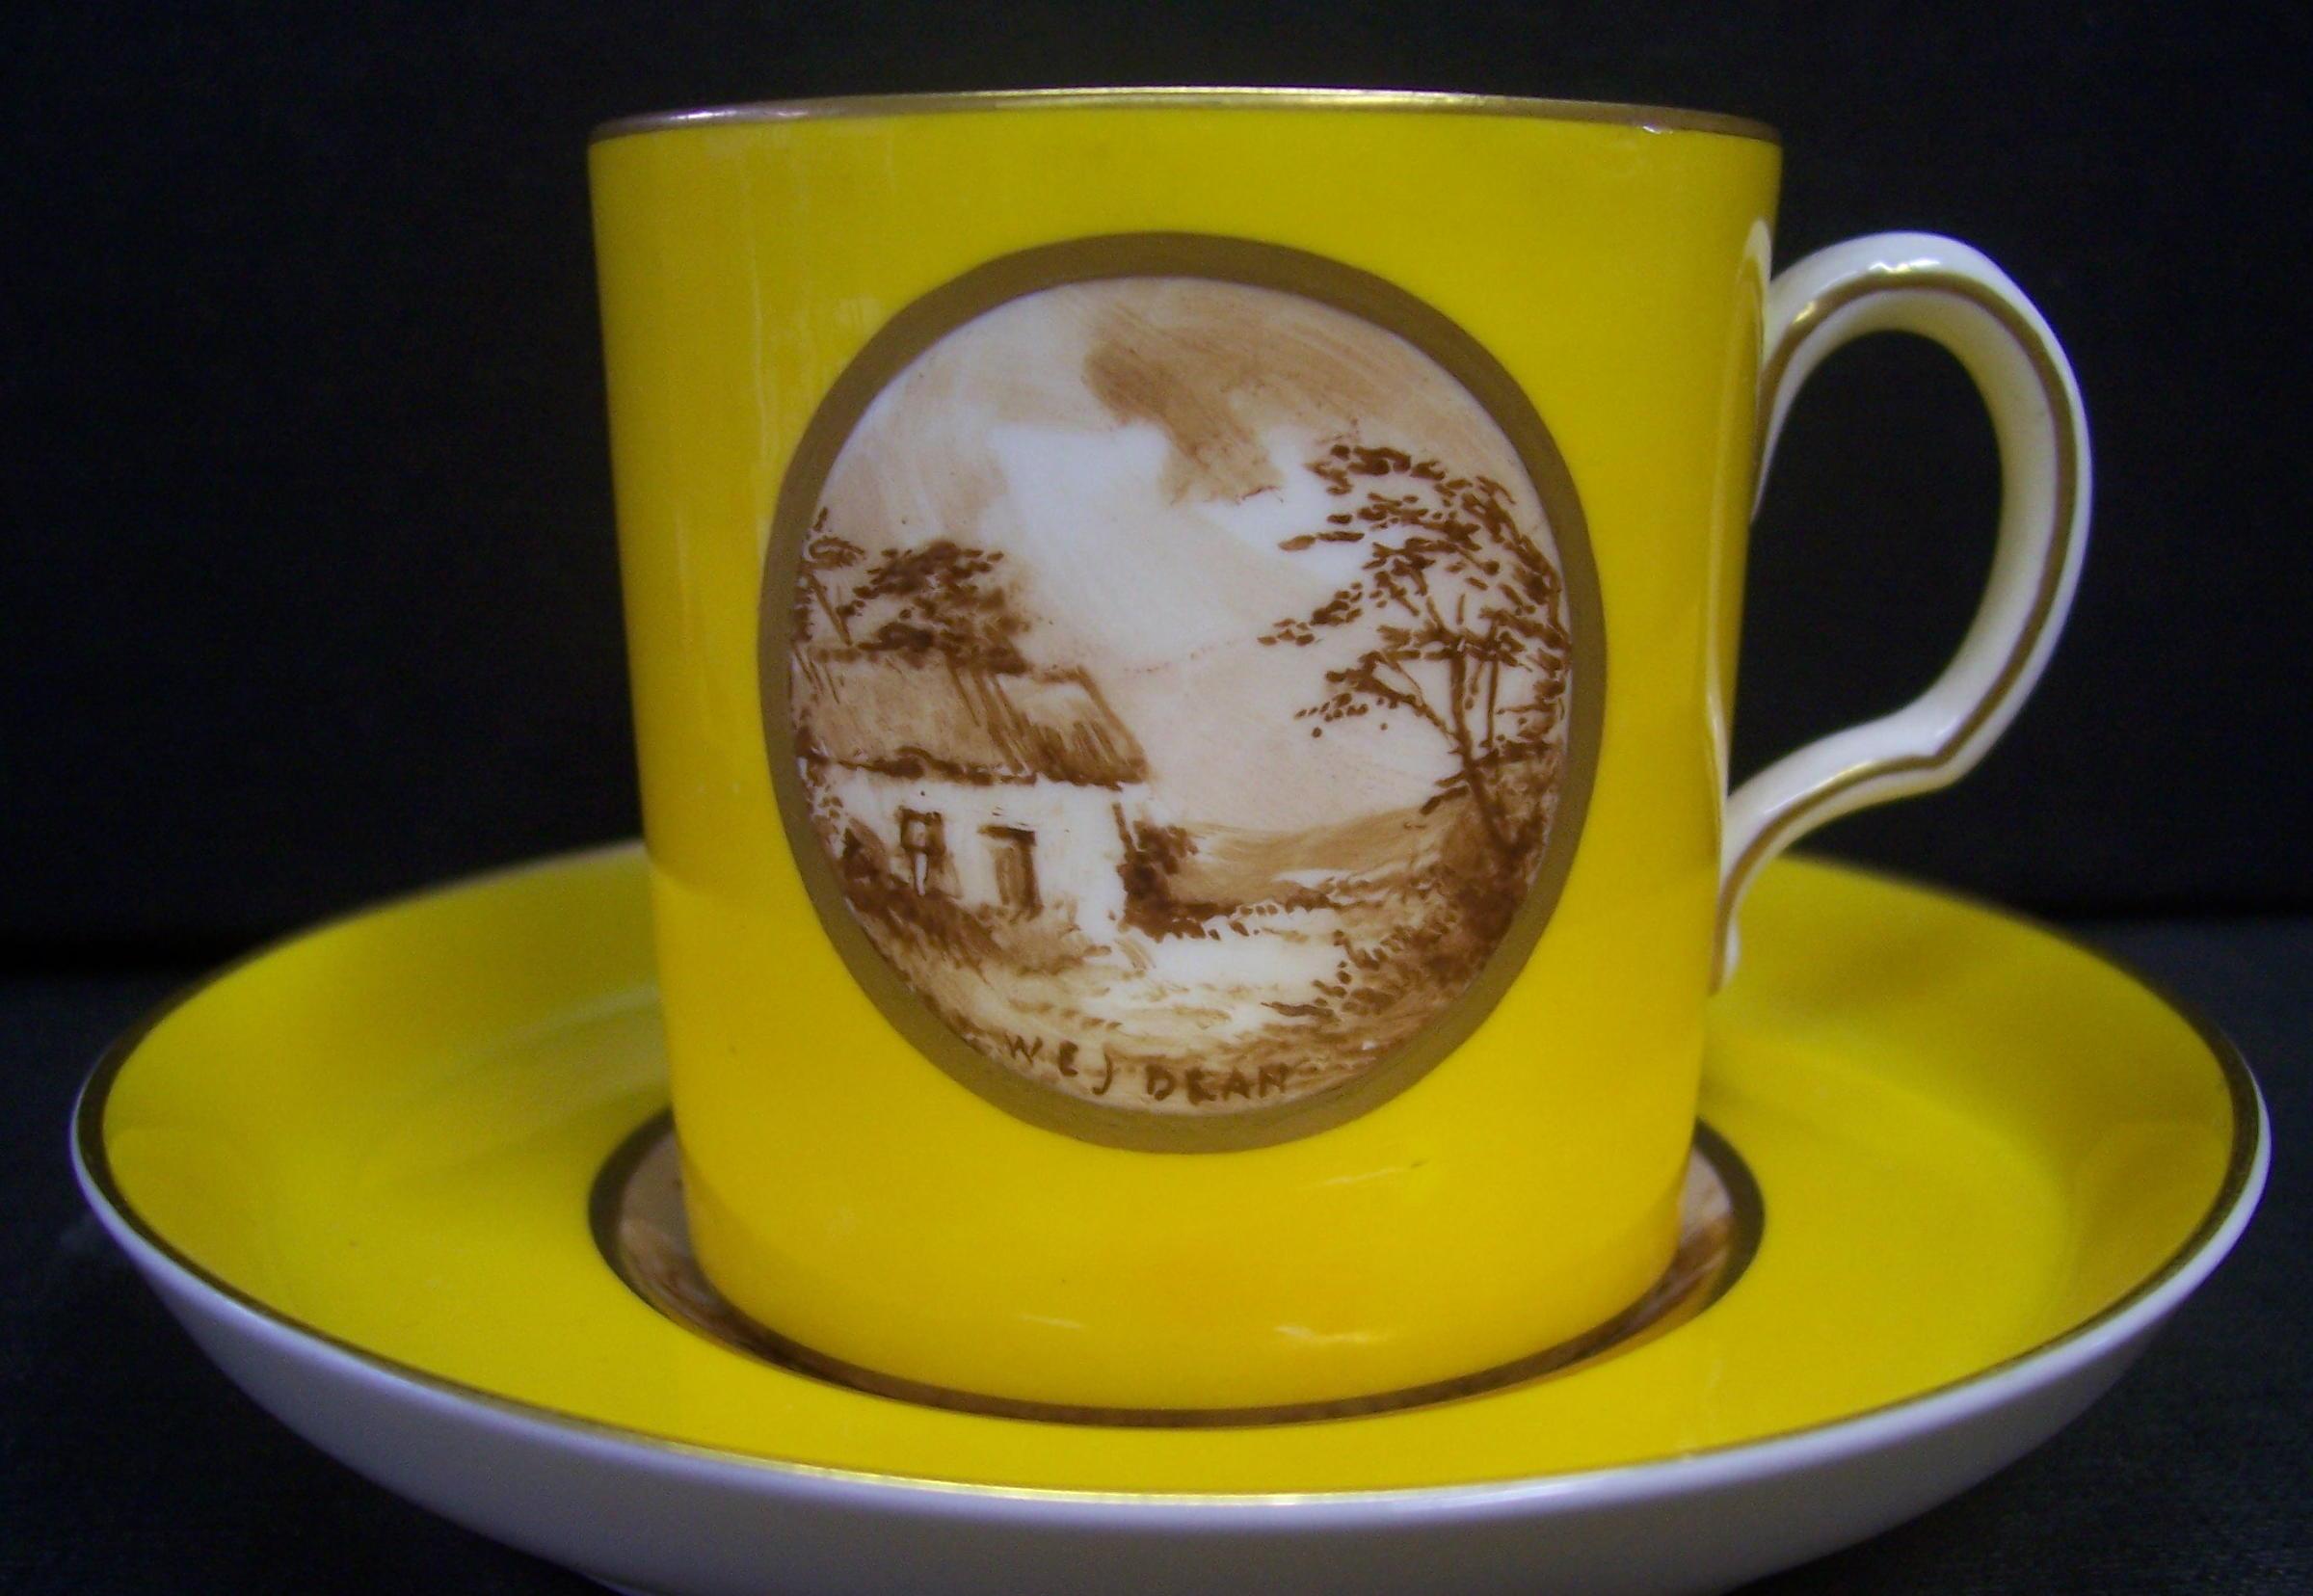 royal-crown-derby-edinburgh-yellow-oval-sepia-rural-scene-dean-A550-probably